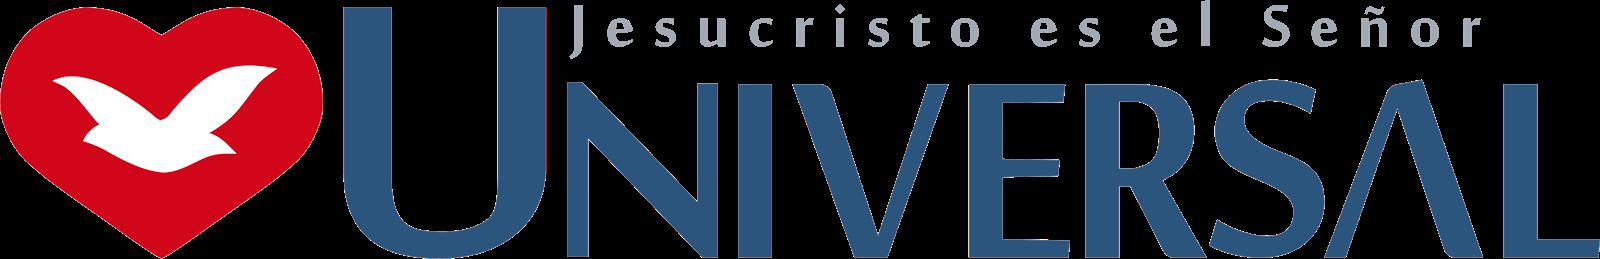 igreja umiversal logo simbolo - Igreja Universal Logo - Simbolo IURD